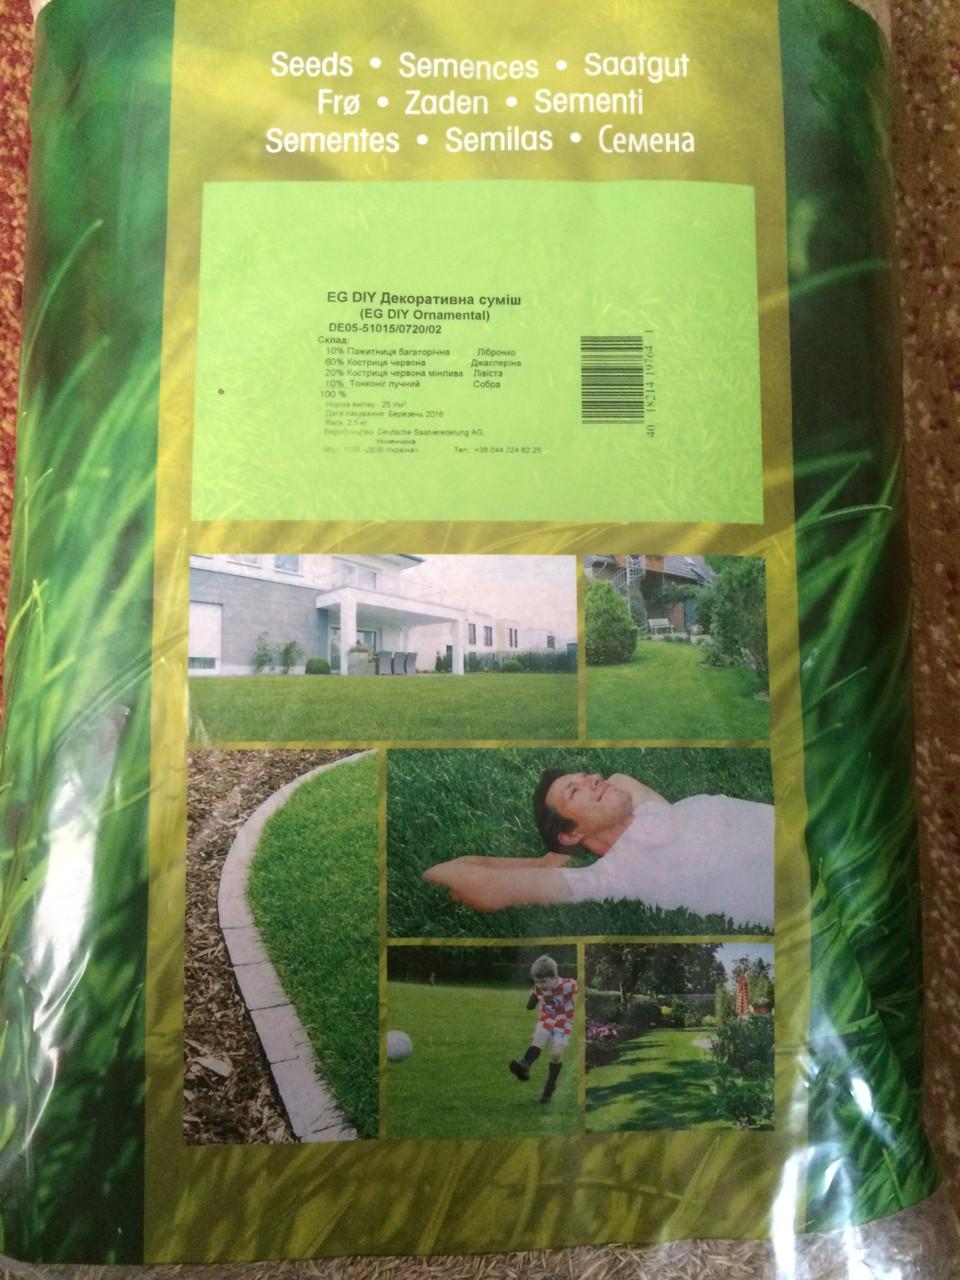 Газонная трава DSV (Euro Grass) Ornamental Декоративная 2,5 кг, Германия НА РАЗВЕС